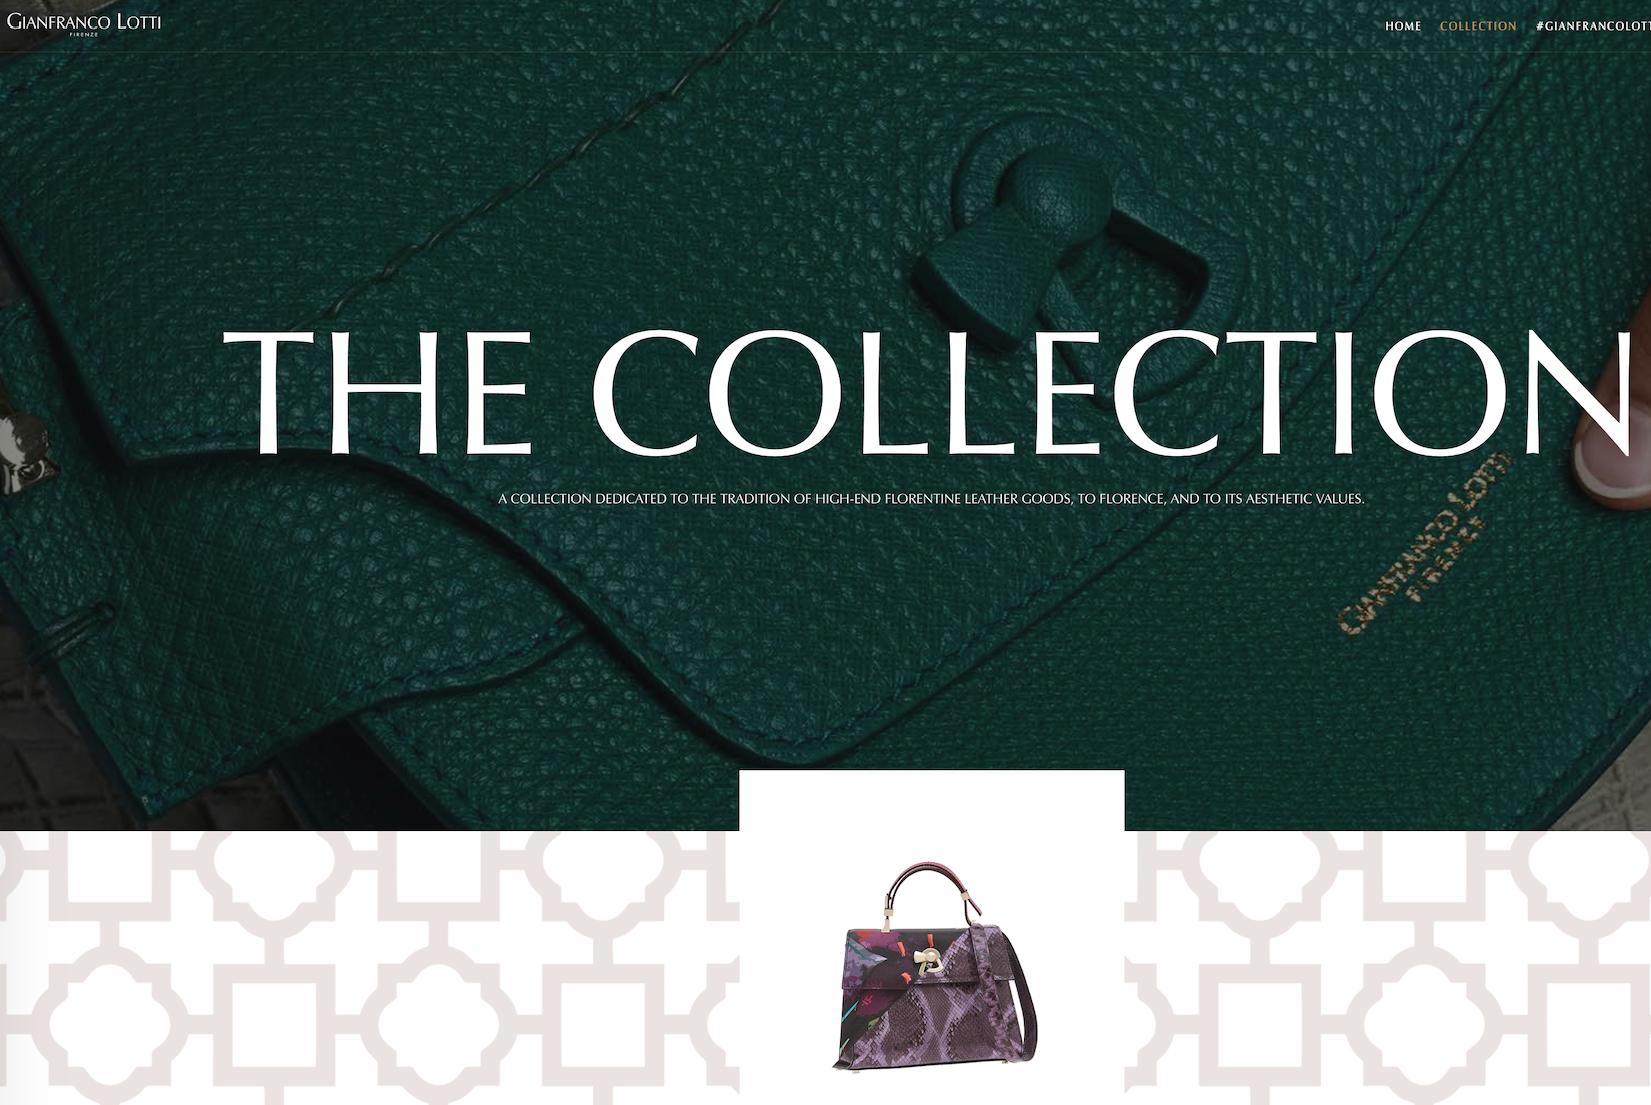 Chanel 长年供应商、意大利托斯卡纳包袋生产商 BMB 股权易手